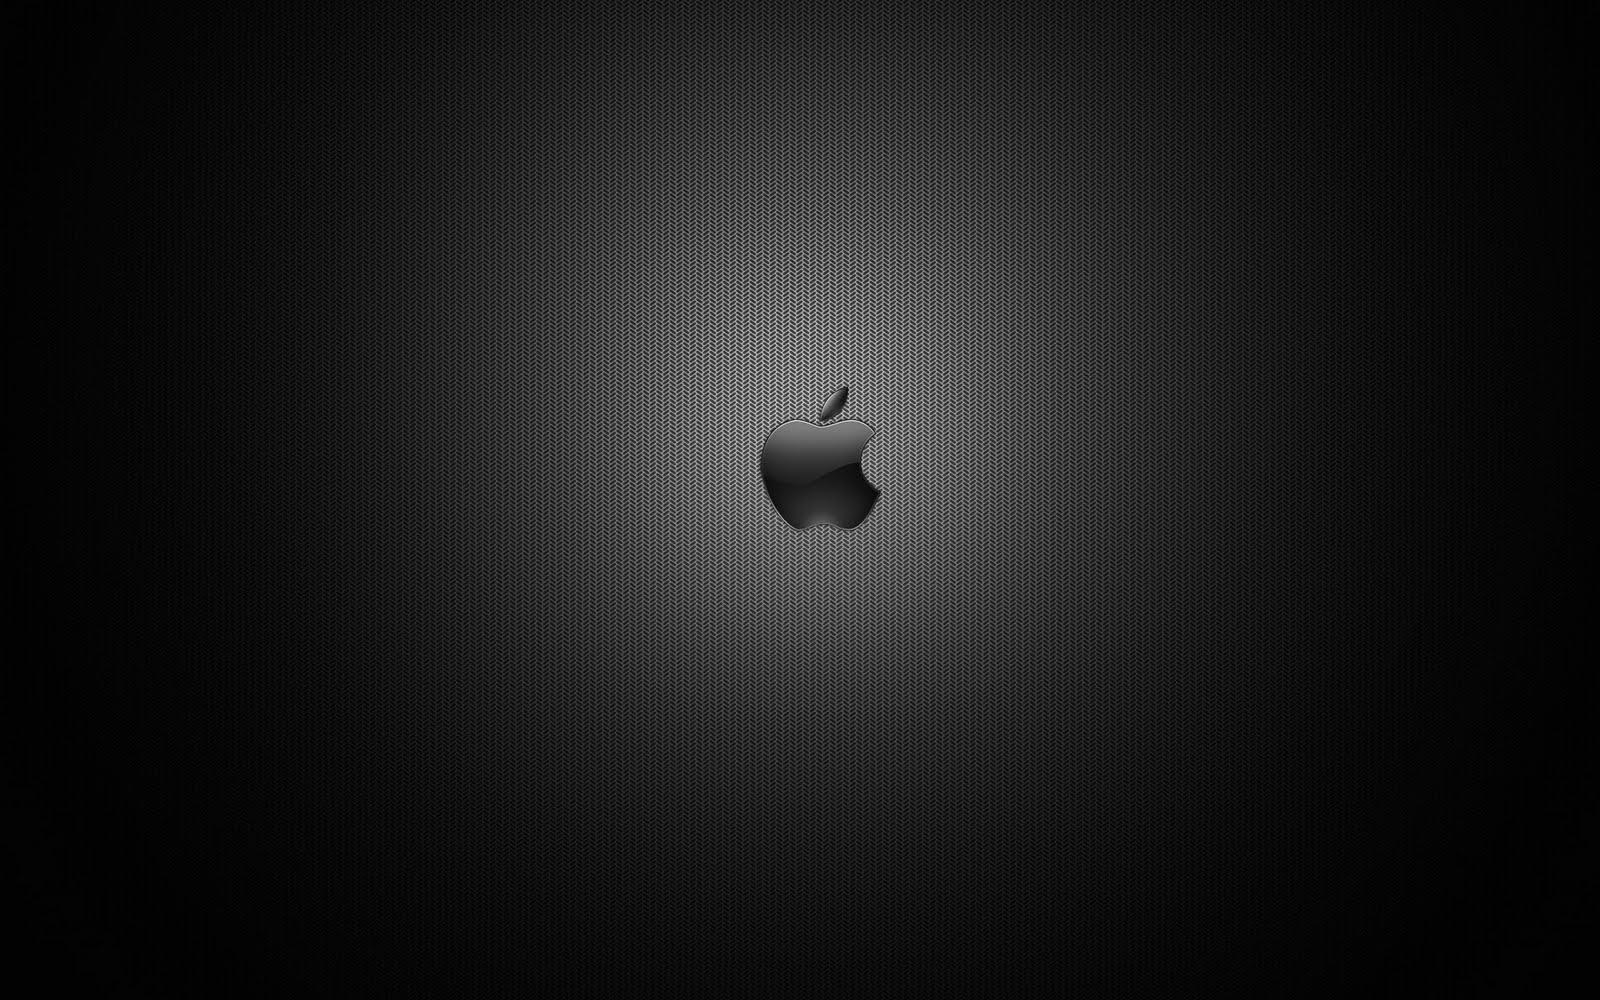 http://1.bp.blogspot.com/-Bhs3WbXFwIM/TVwNbygPbNI/AAAAAAAABA8/2SAAXDz6w1o/s1600/Apple%2BWallpaper%2B%252818%2529.jpg